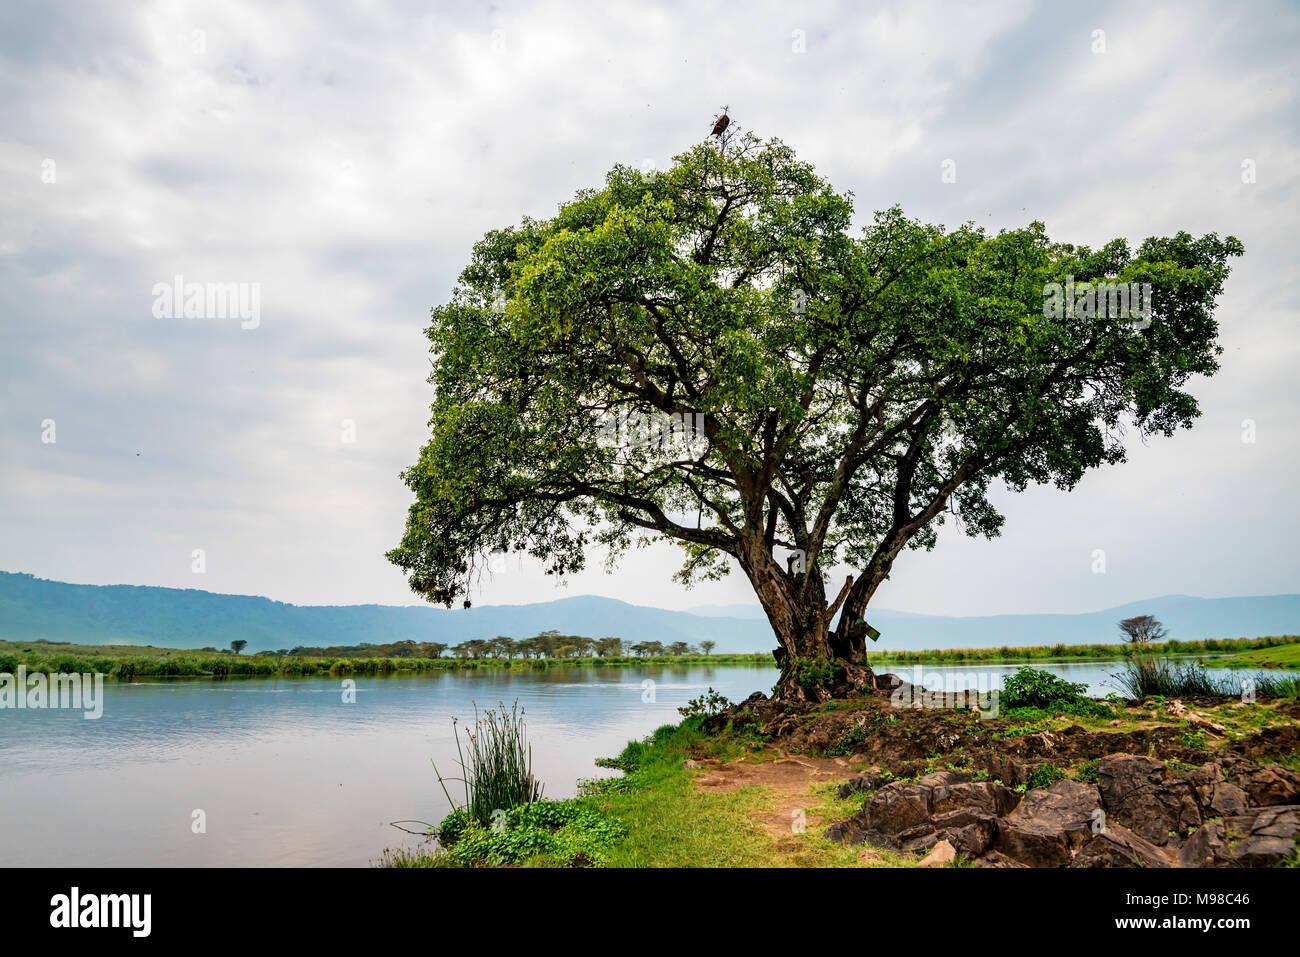 Scenic savannah landscape - Stock Image